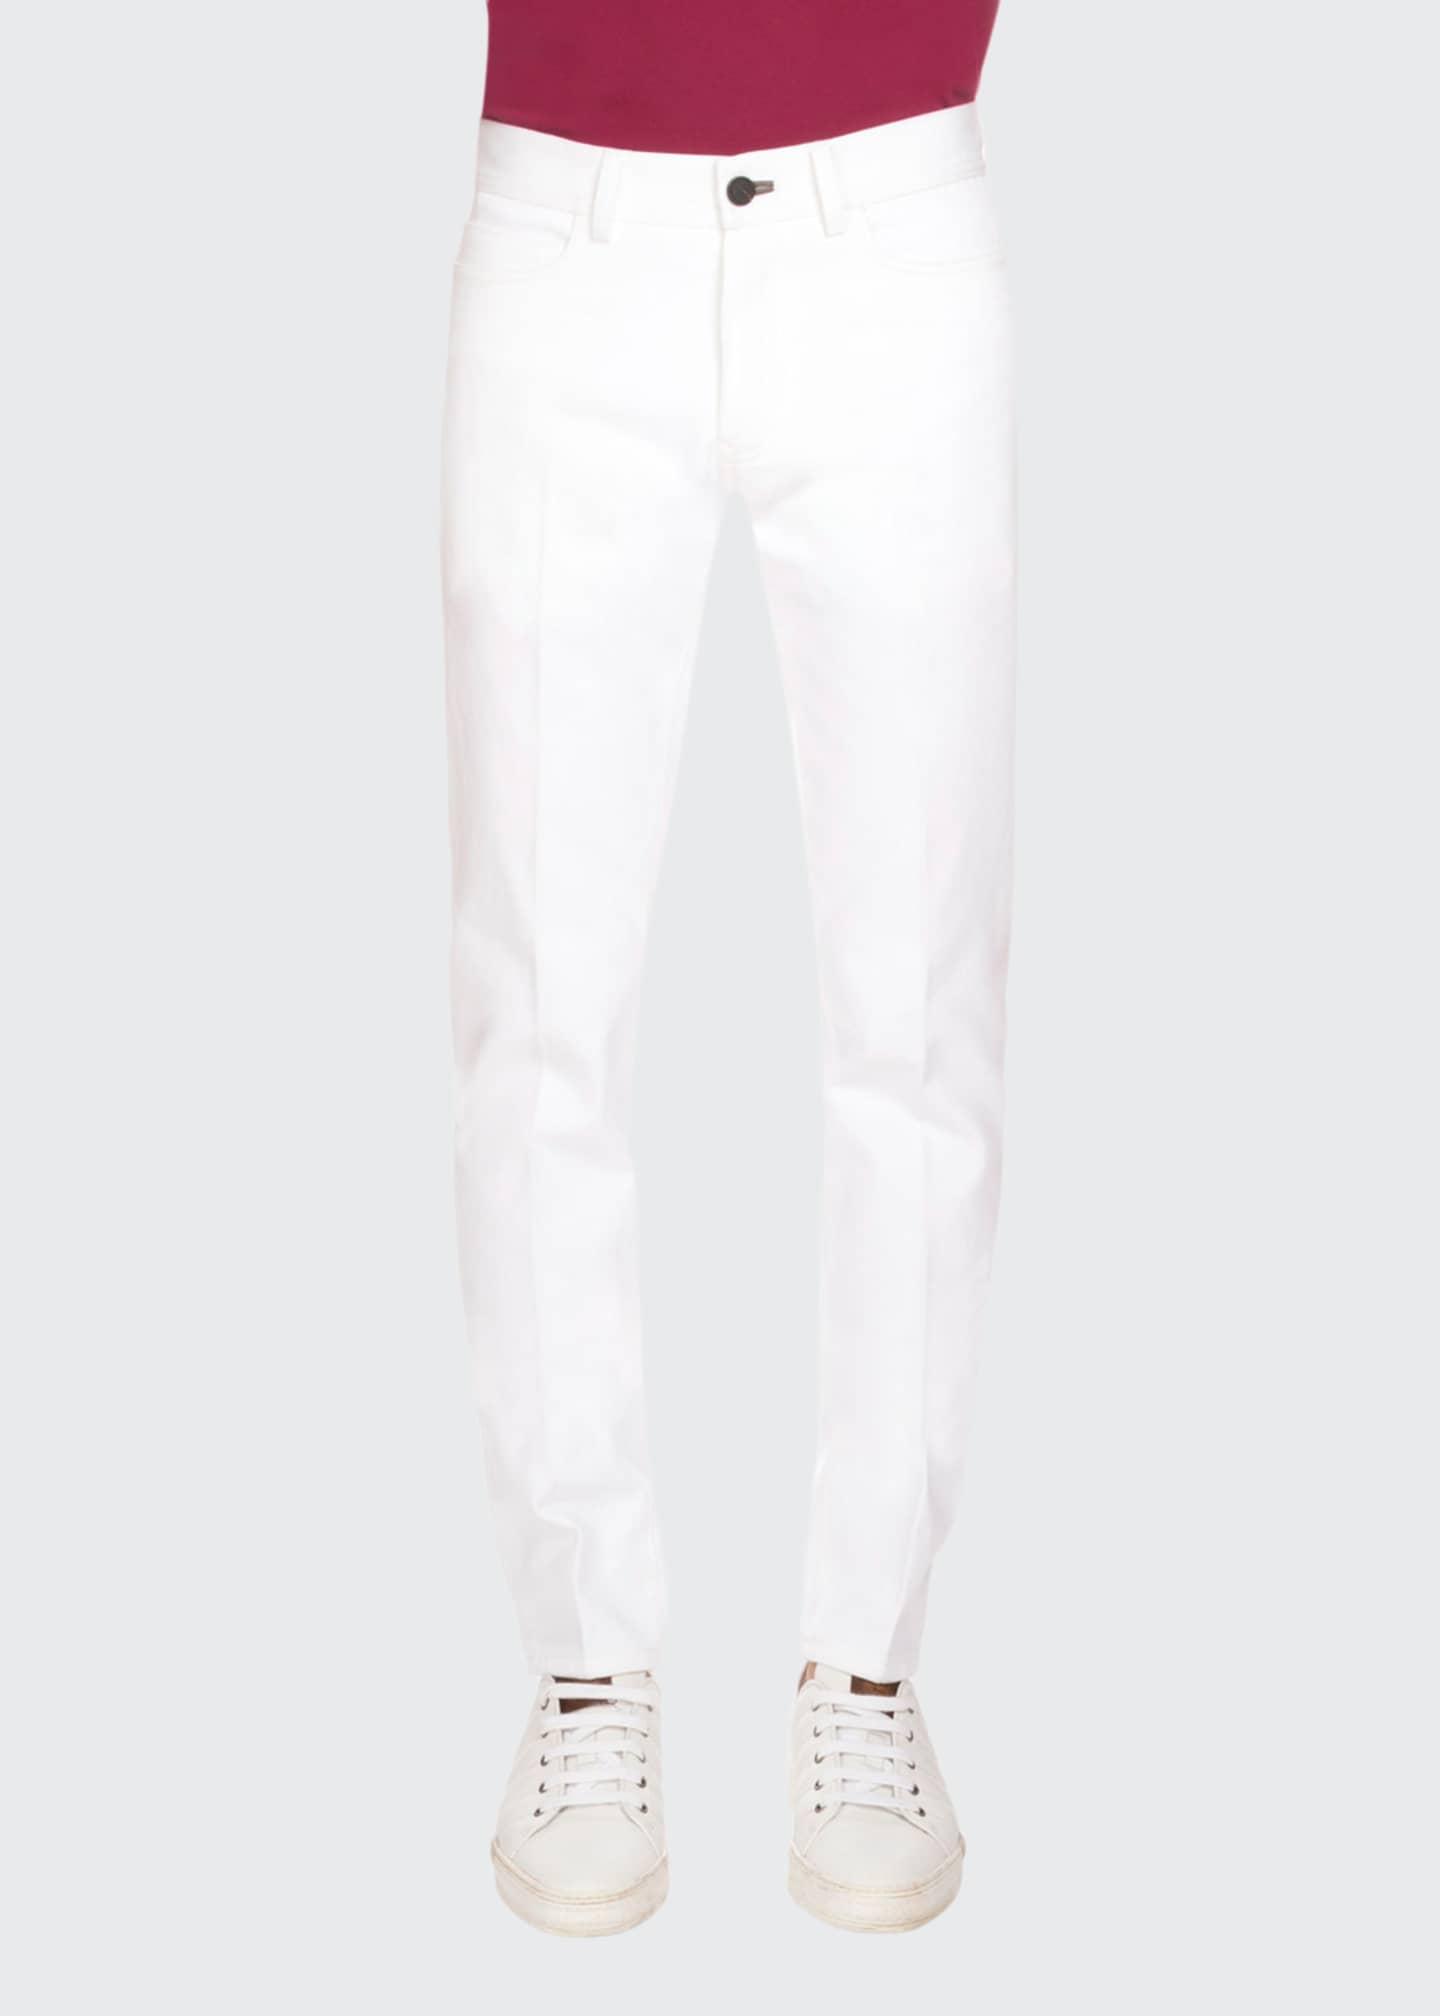 Berluti Five-Pocket Denim Jeans, Optical White